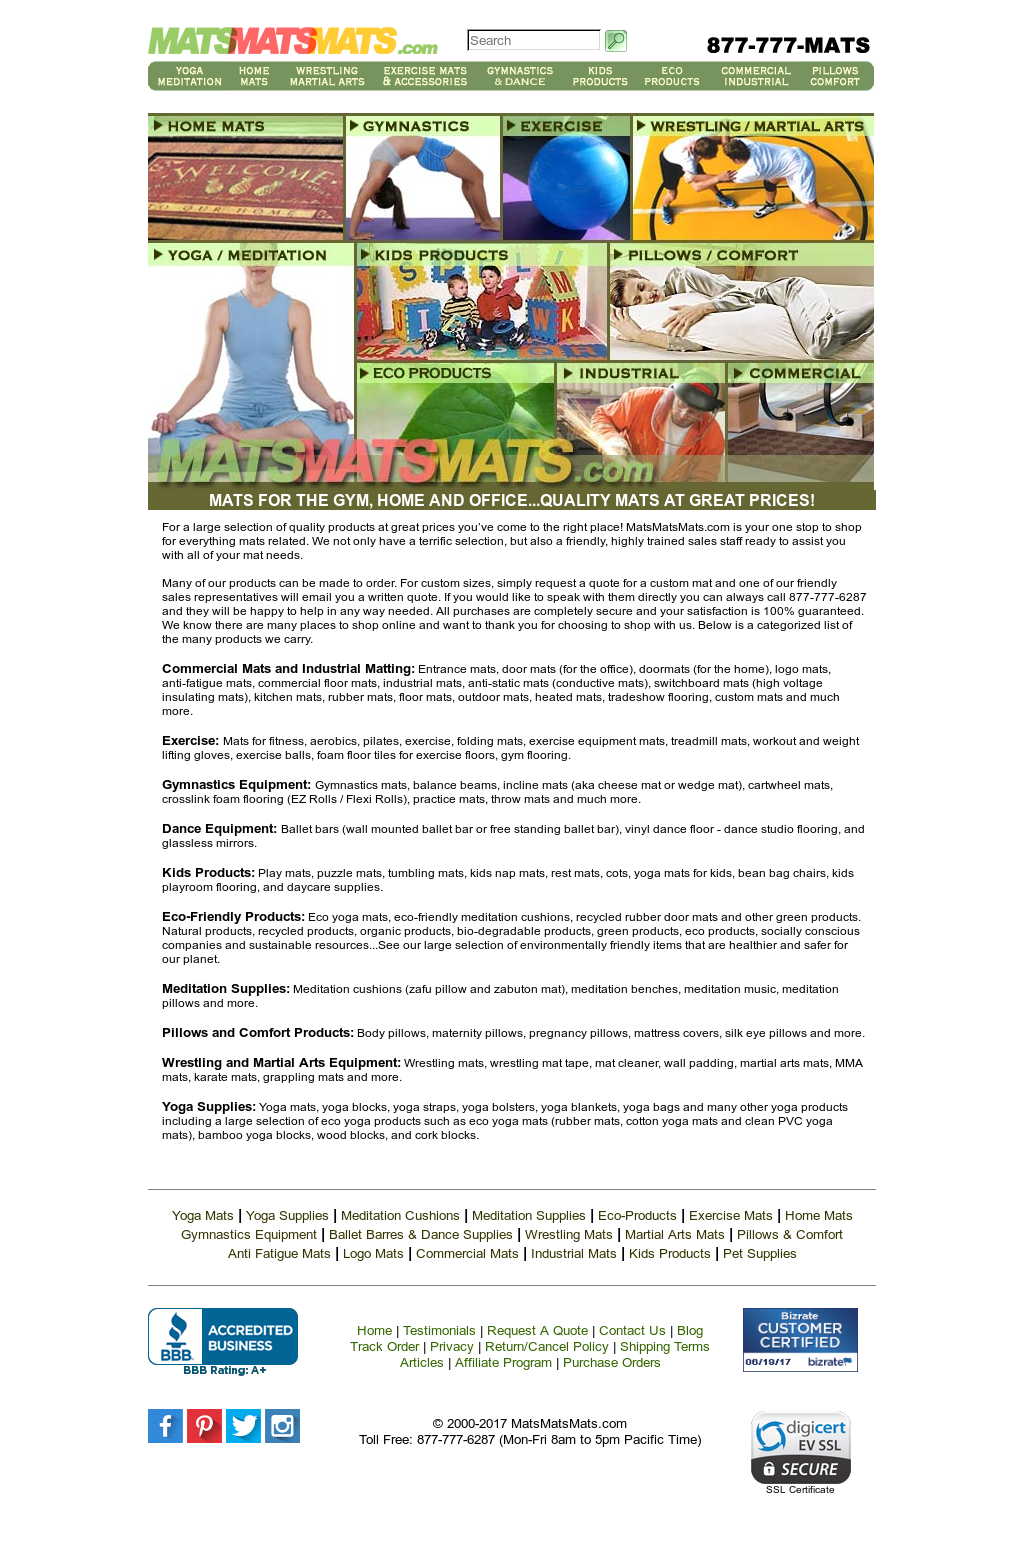 Matsmatsmats Competitors, Revenue and Employees - Owler Company Profile